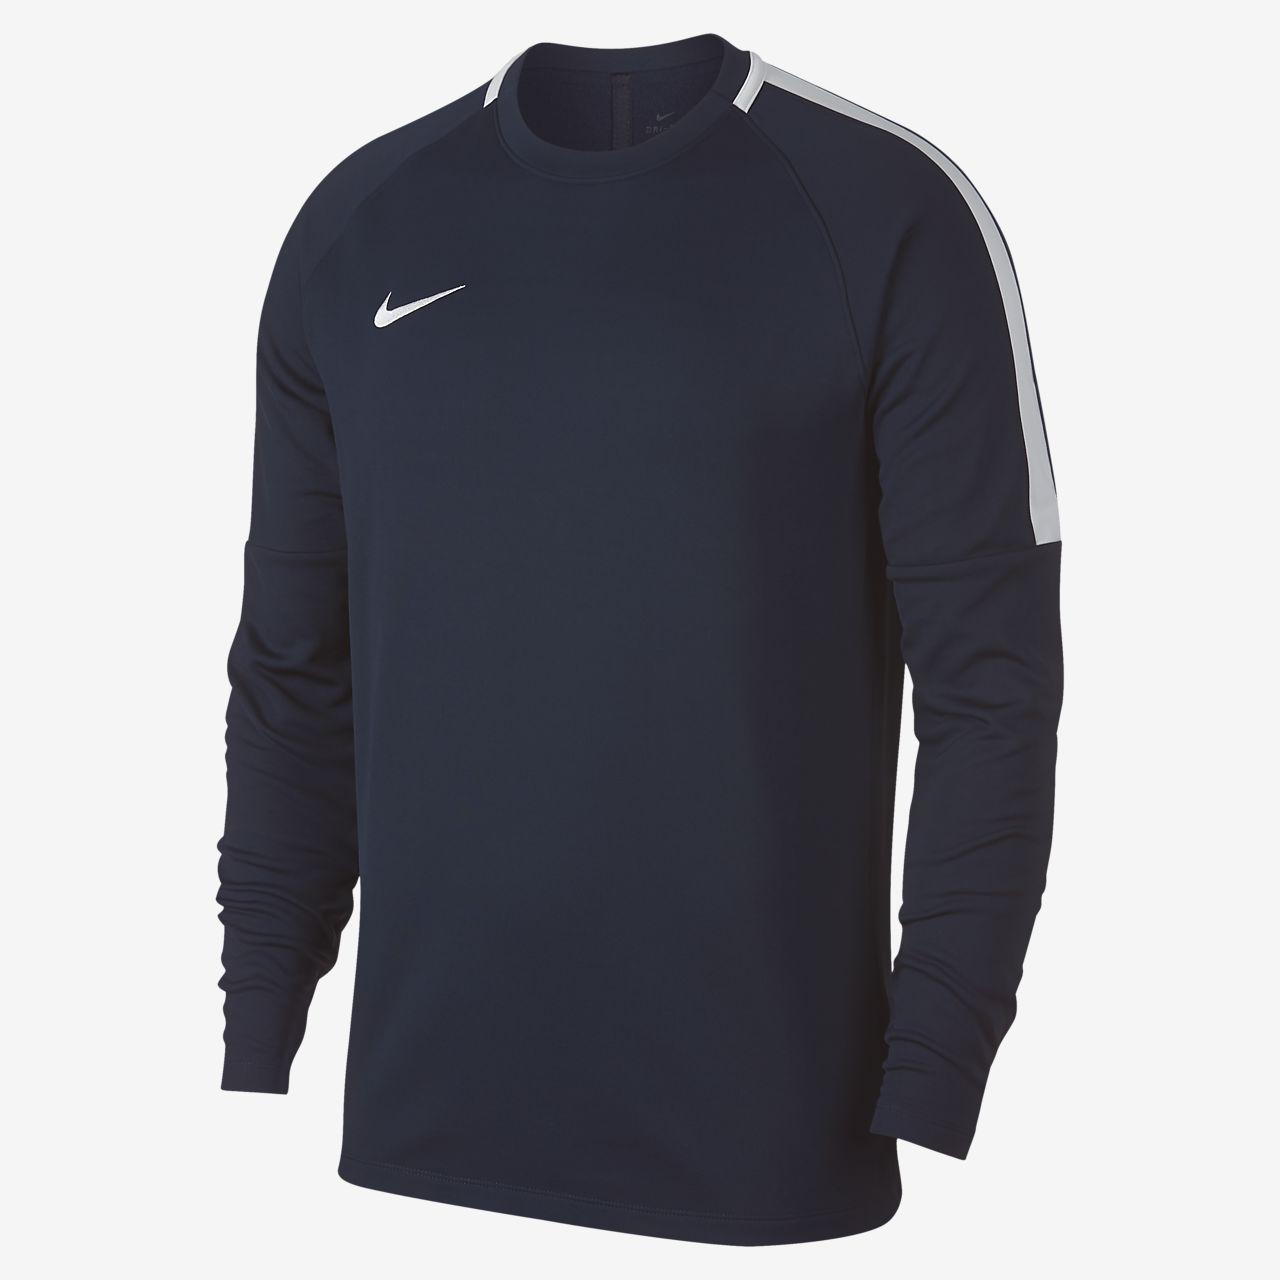 affed29d Мужская футбольная толстовка Nike Dri-FIT Academy. Nike.com RU